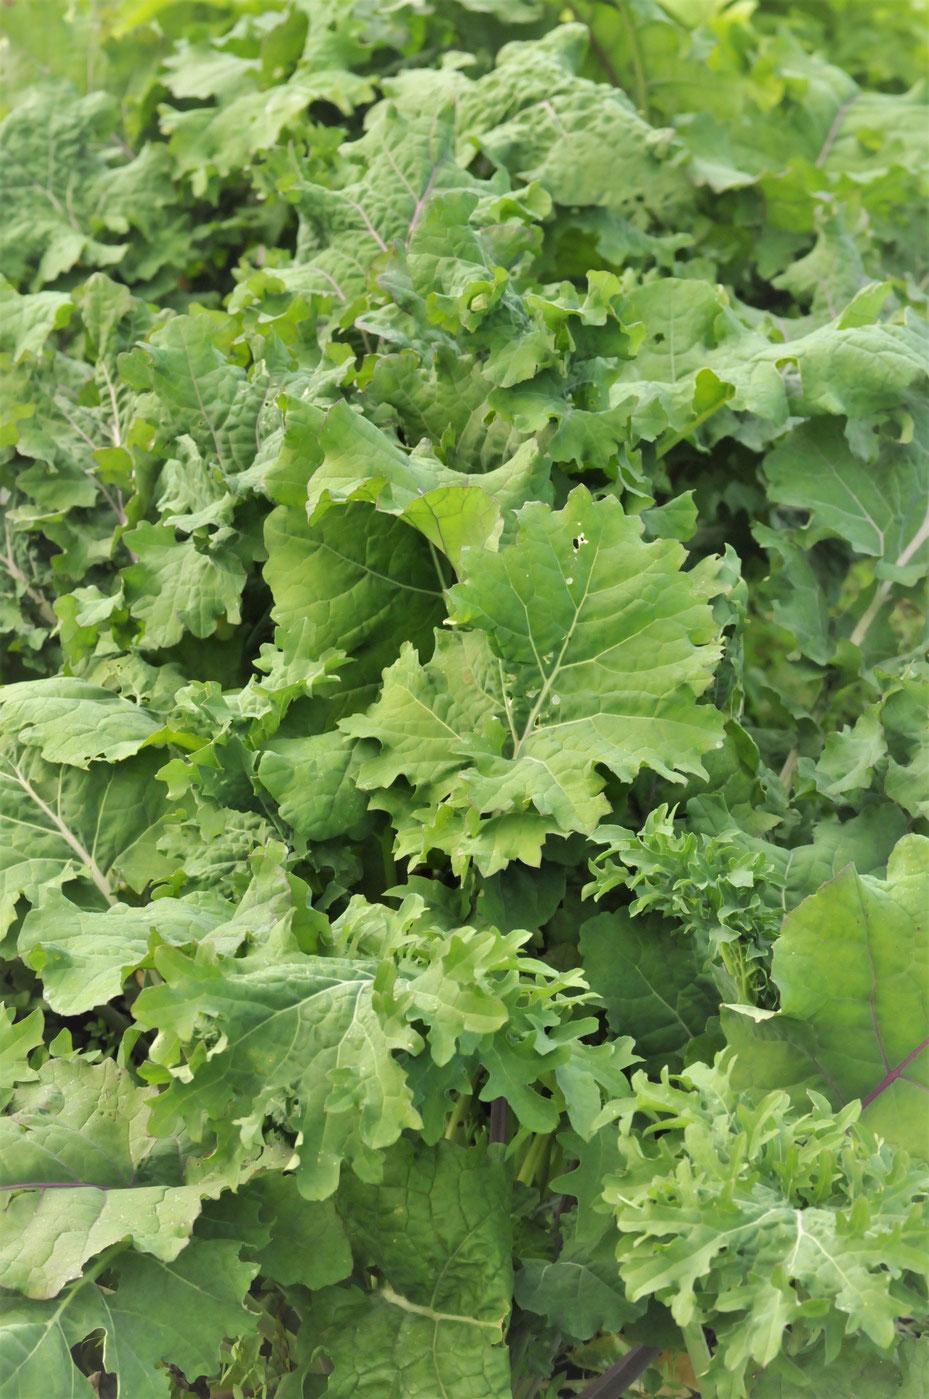 ケール 自然栽培 固定種 農業体験首都圏 体験農場首都圏 野菜作り教室首都圏  さとやま農学校 無農薬栽培